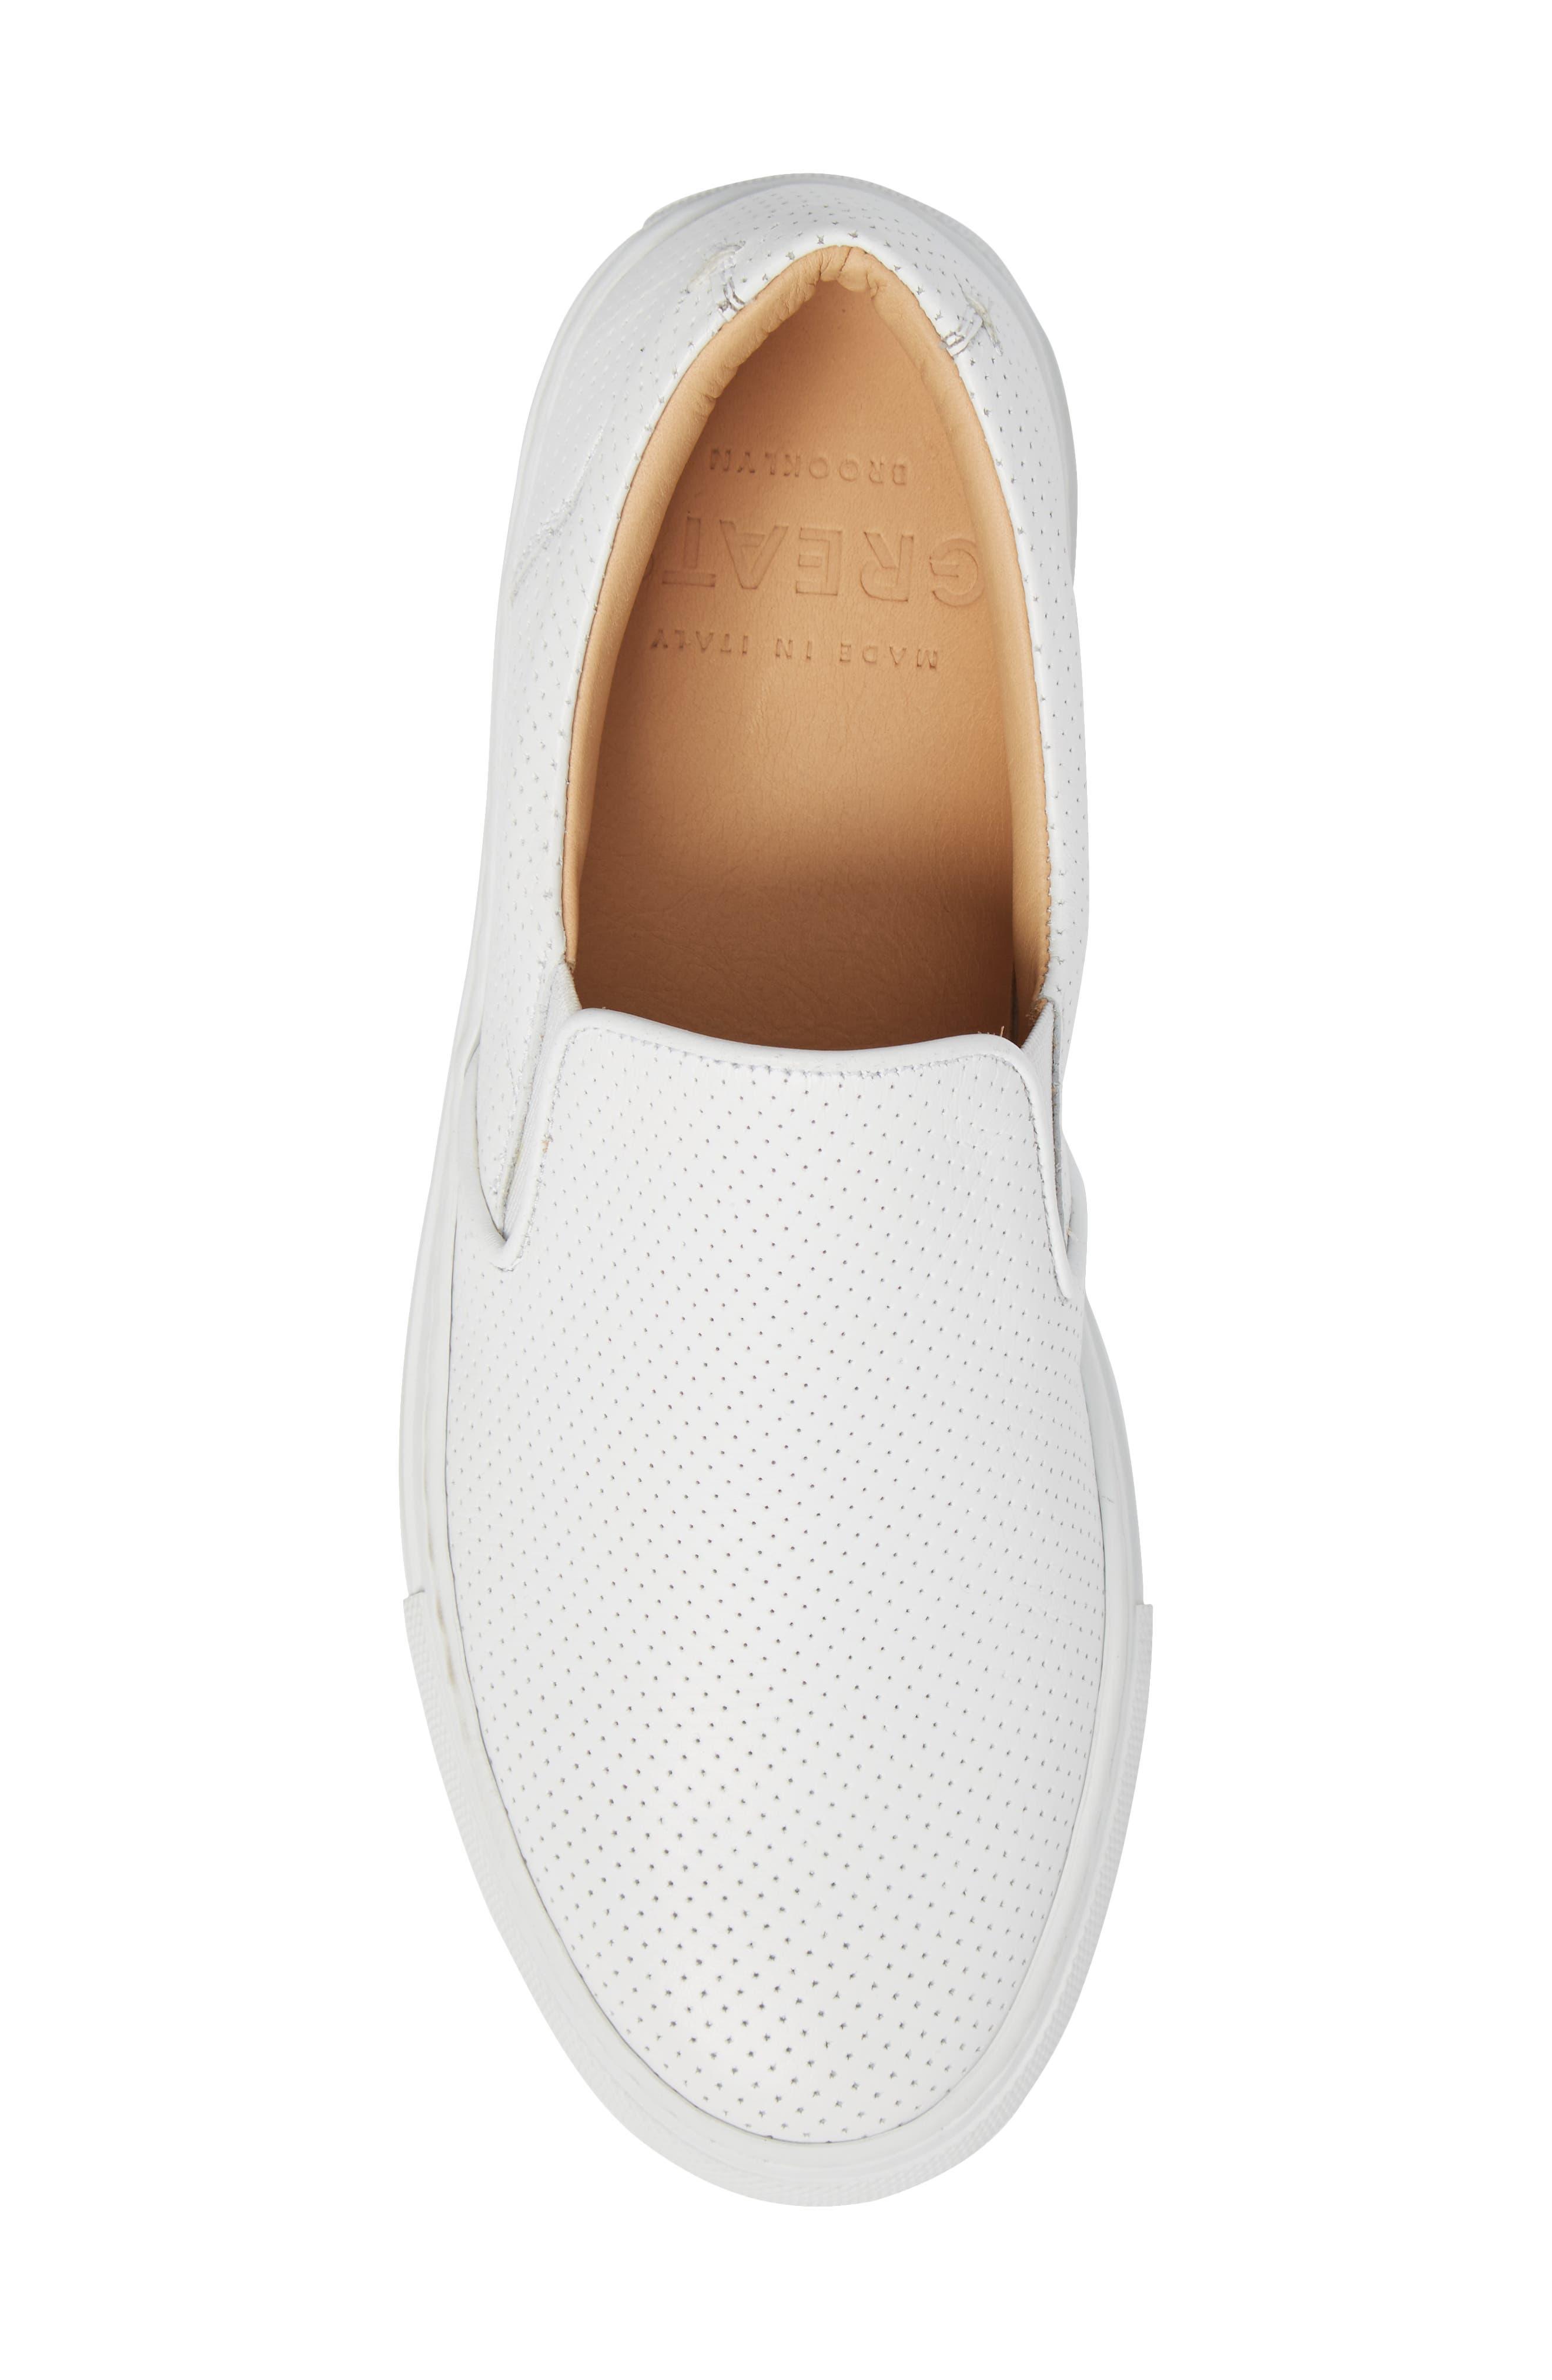 Wooster Slip-On Sneaker,                             Alternate thumbnail 5, color,                             WHITE PERFORATED